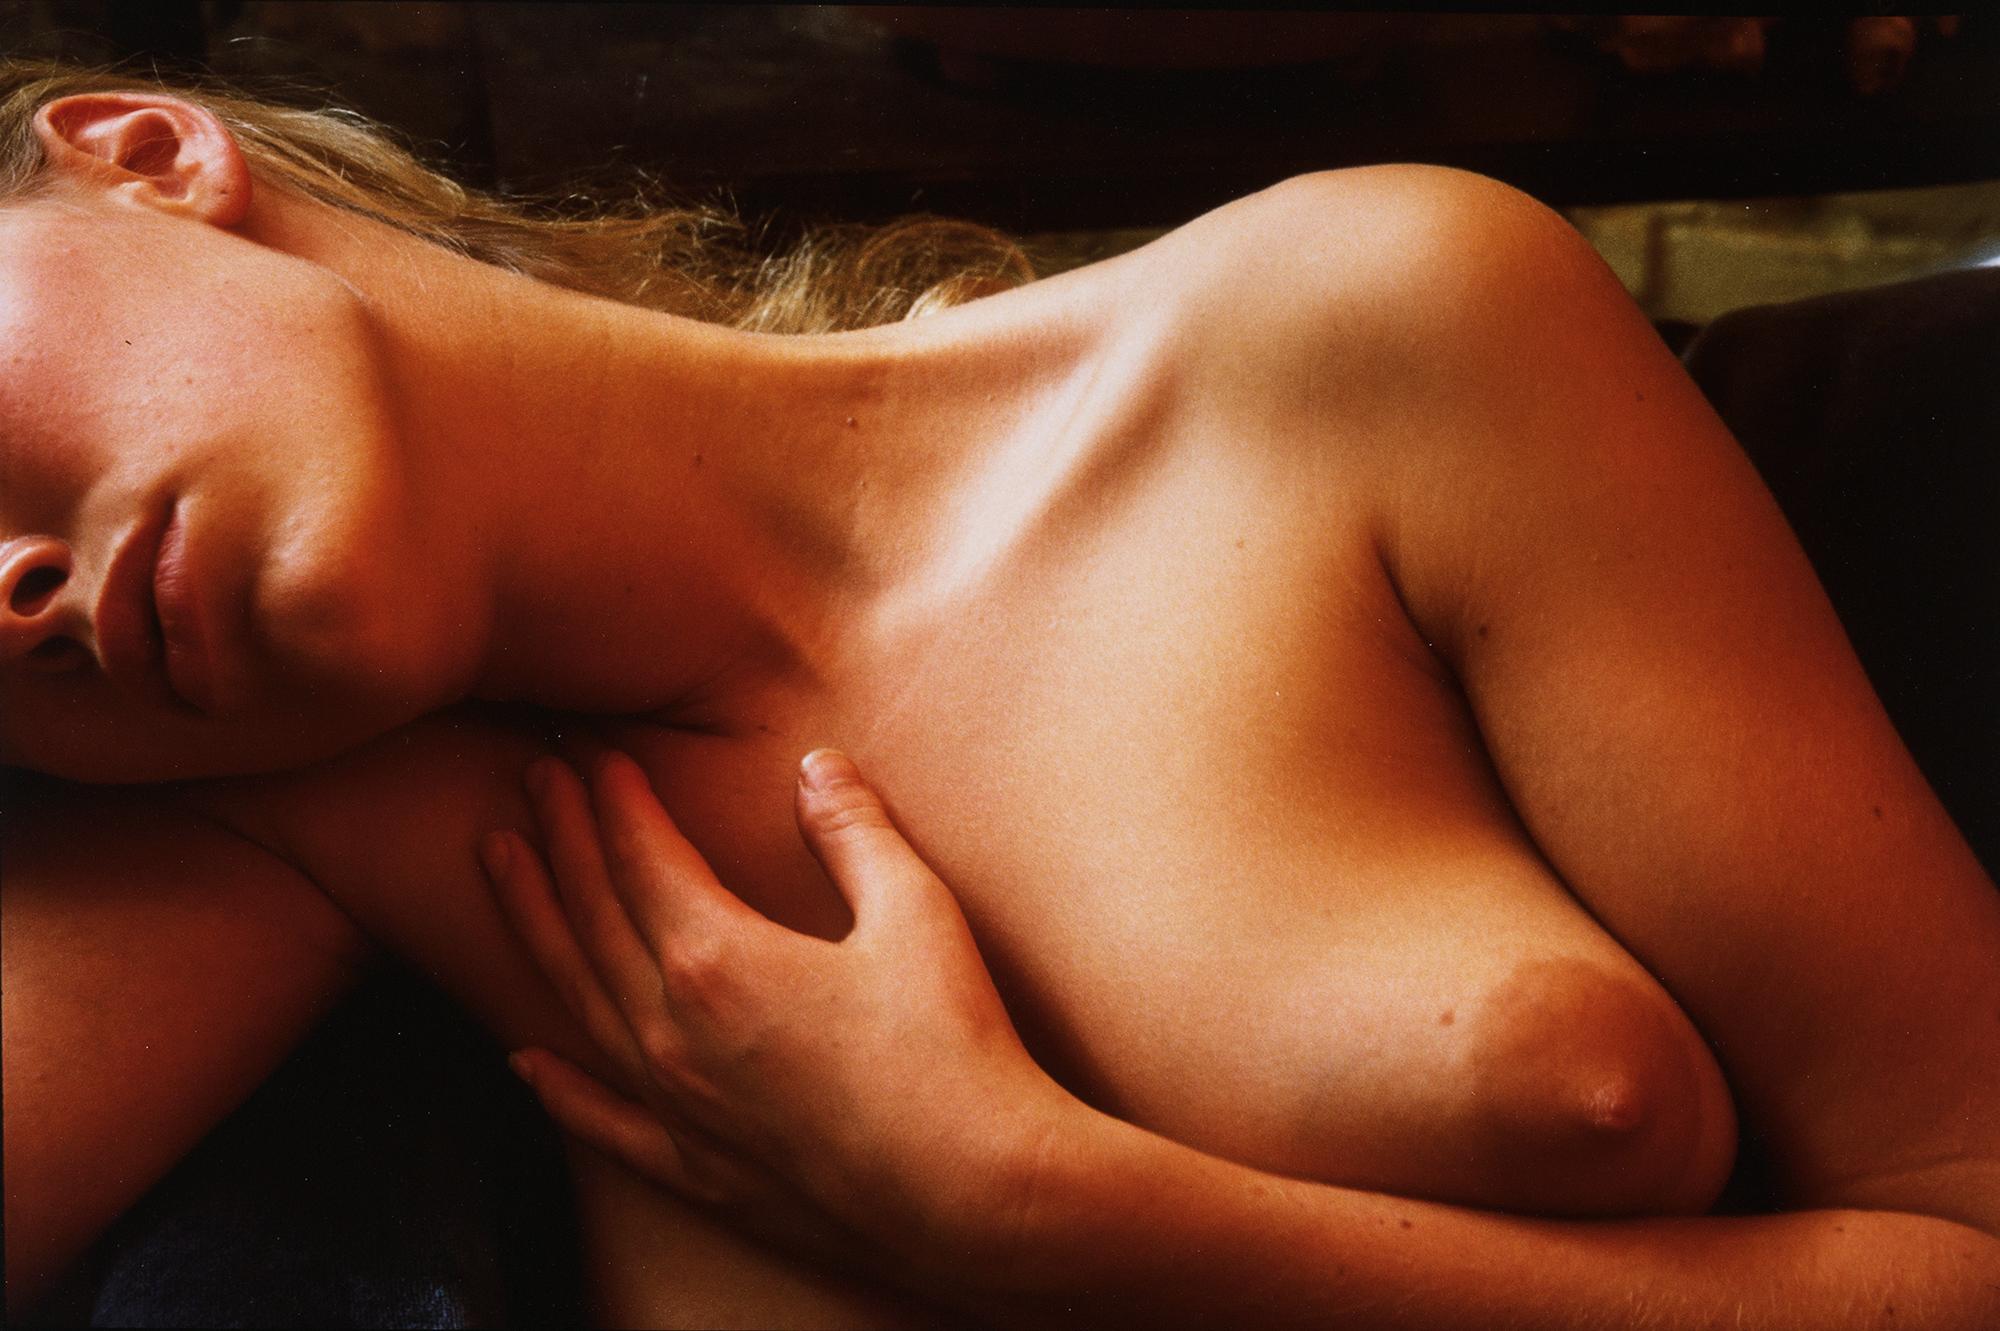 Lucien Clergue Nu, Soho1990Stampa cibachrome vintage, cm 33,5 x 49,5Stima € 2400-2800